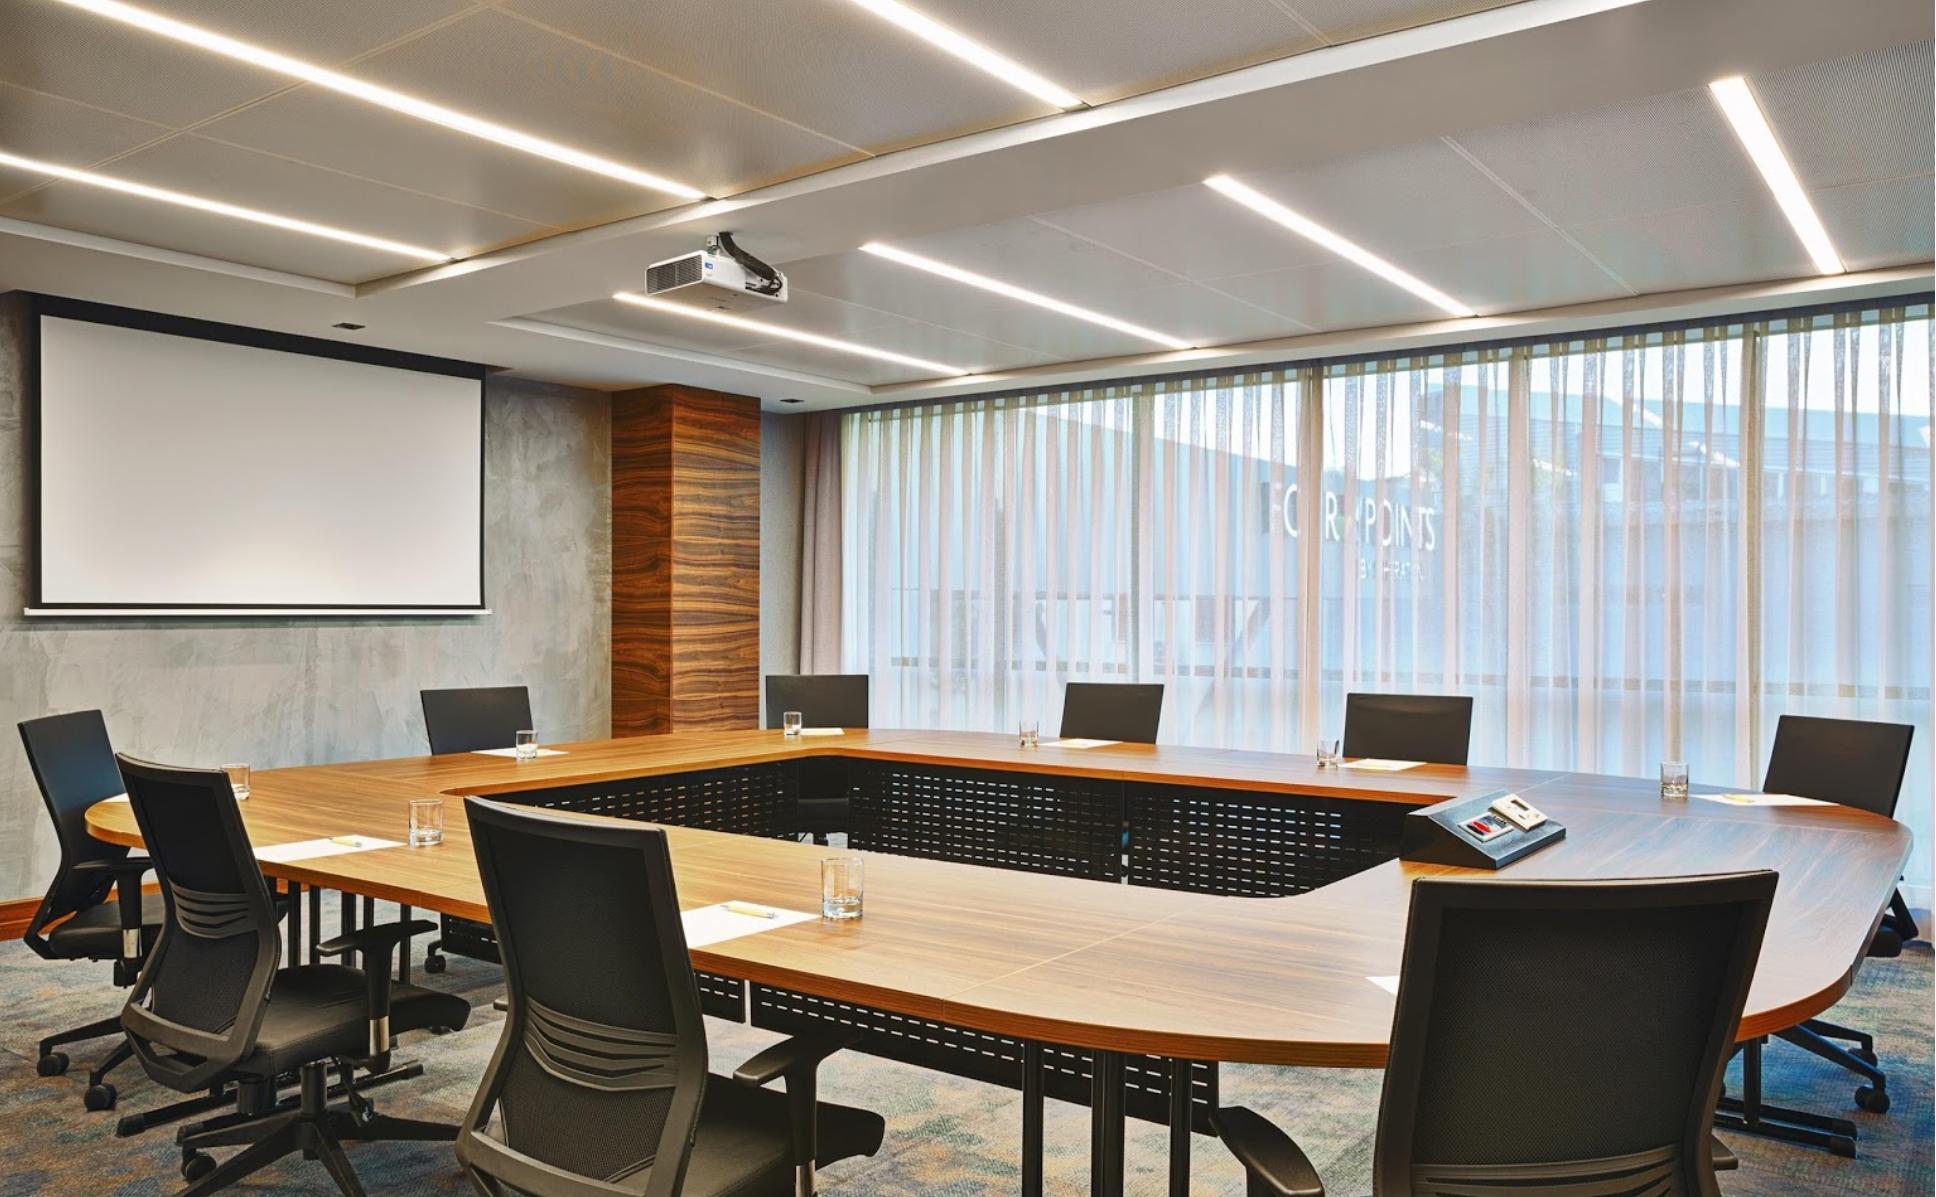 Asia DES Executive Meeting Room